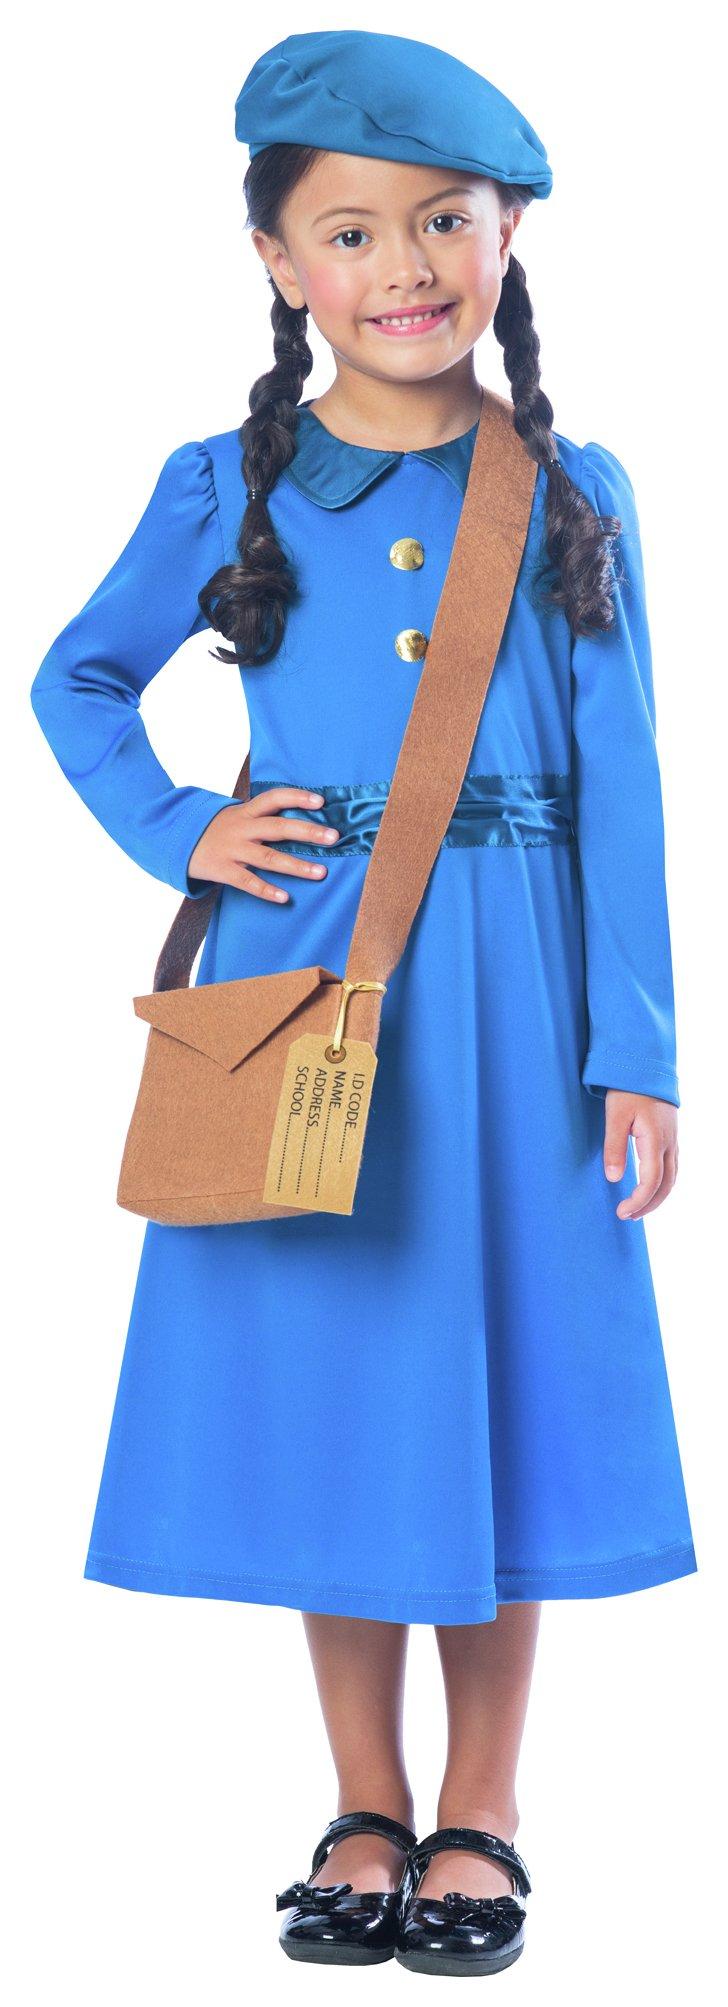 Image of Amscan Evacuee Girl Costume - 7 - 8 Years.